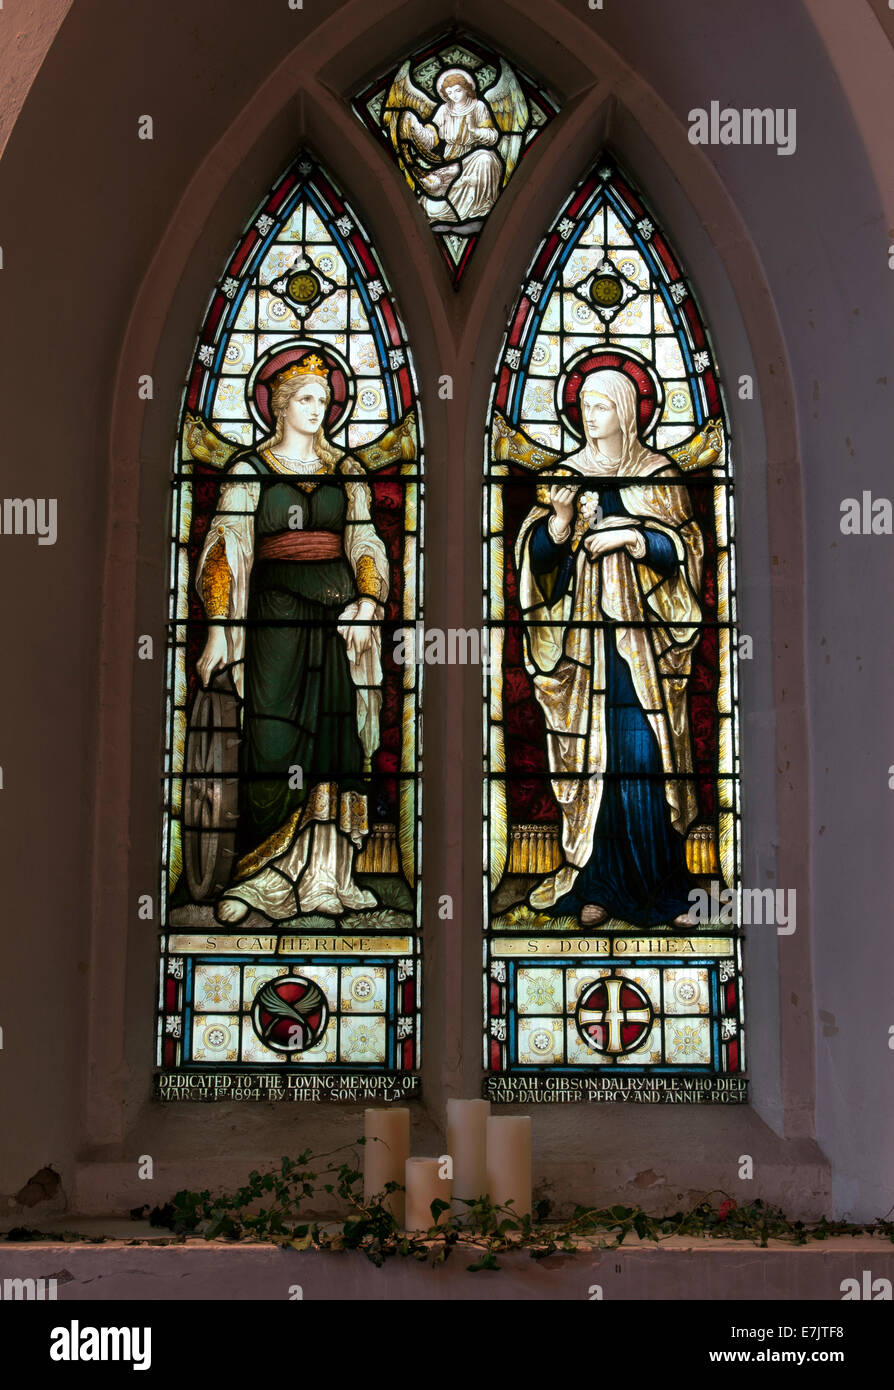 Stained glass in St Bartholomew`s Church, Kirby Muxloe, leicestershire, England, UK - Stock Image